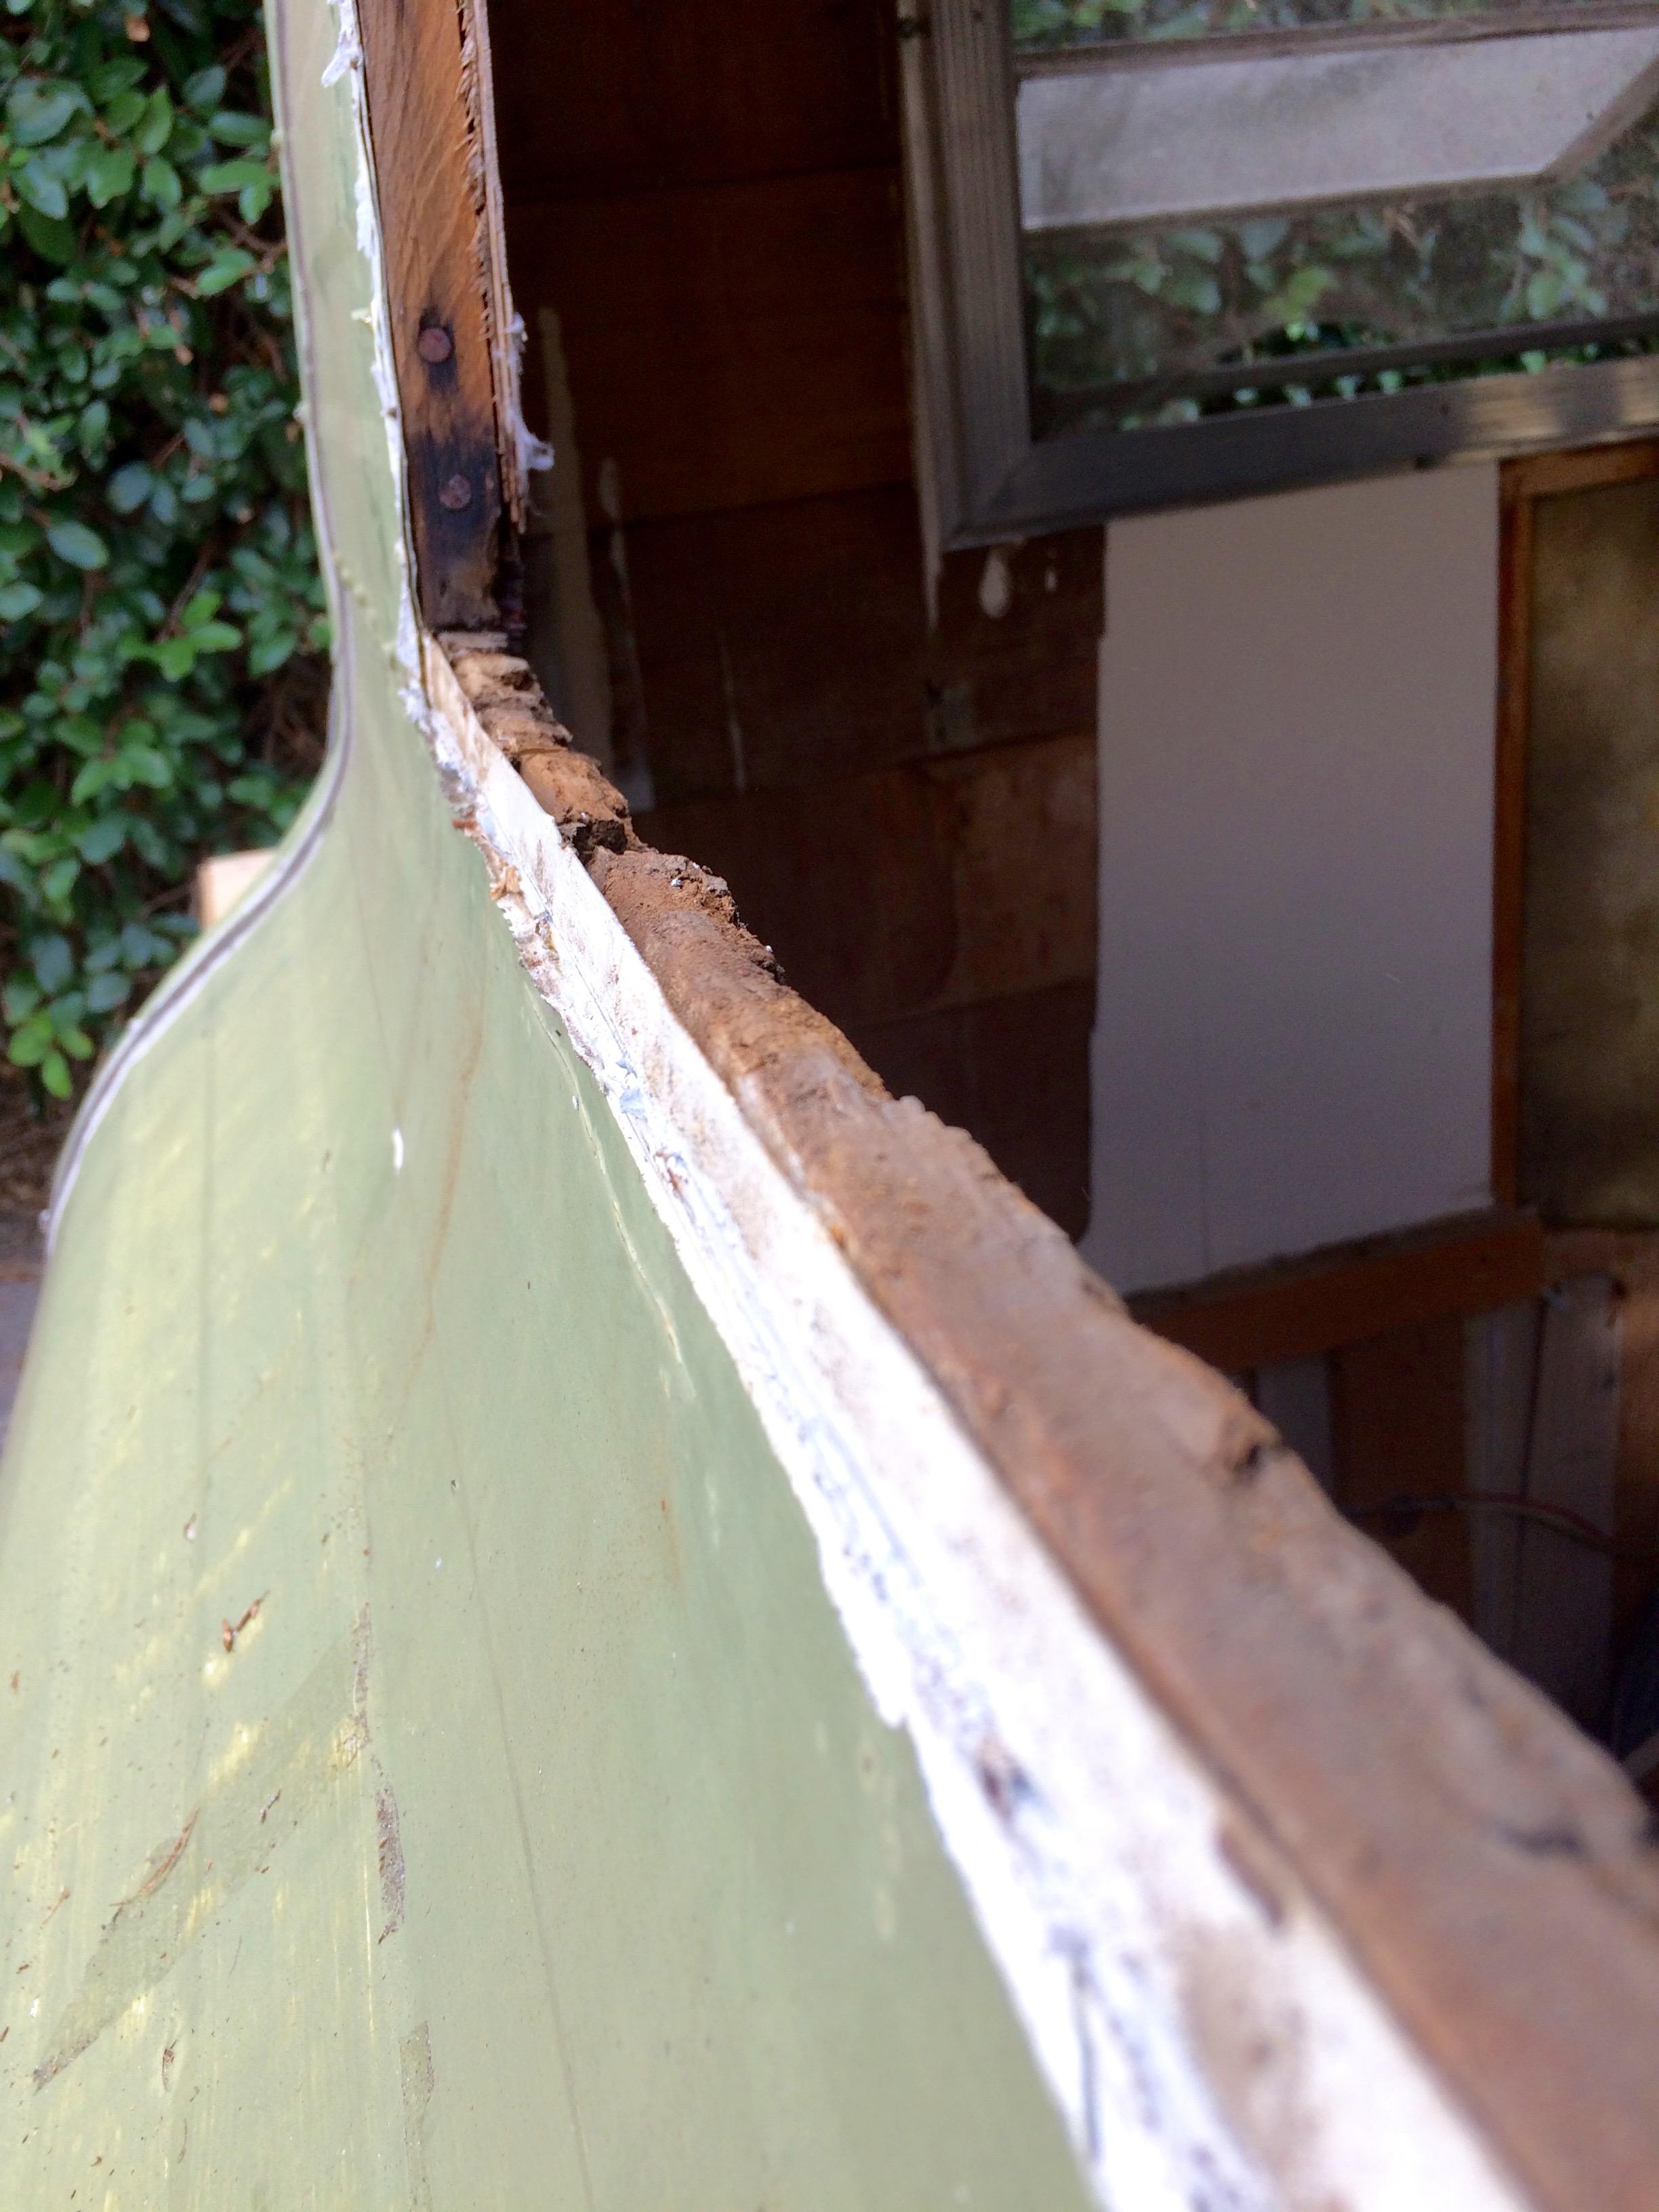 water damage around the window framing